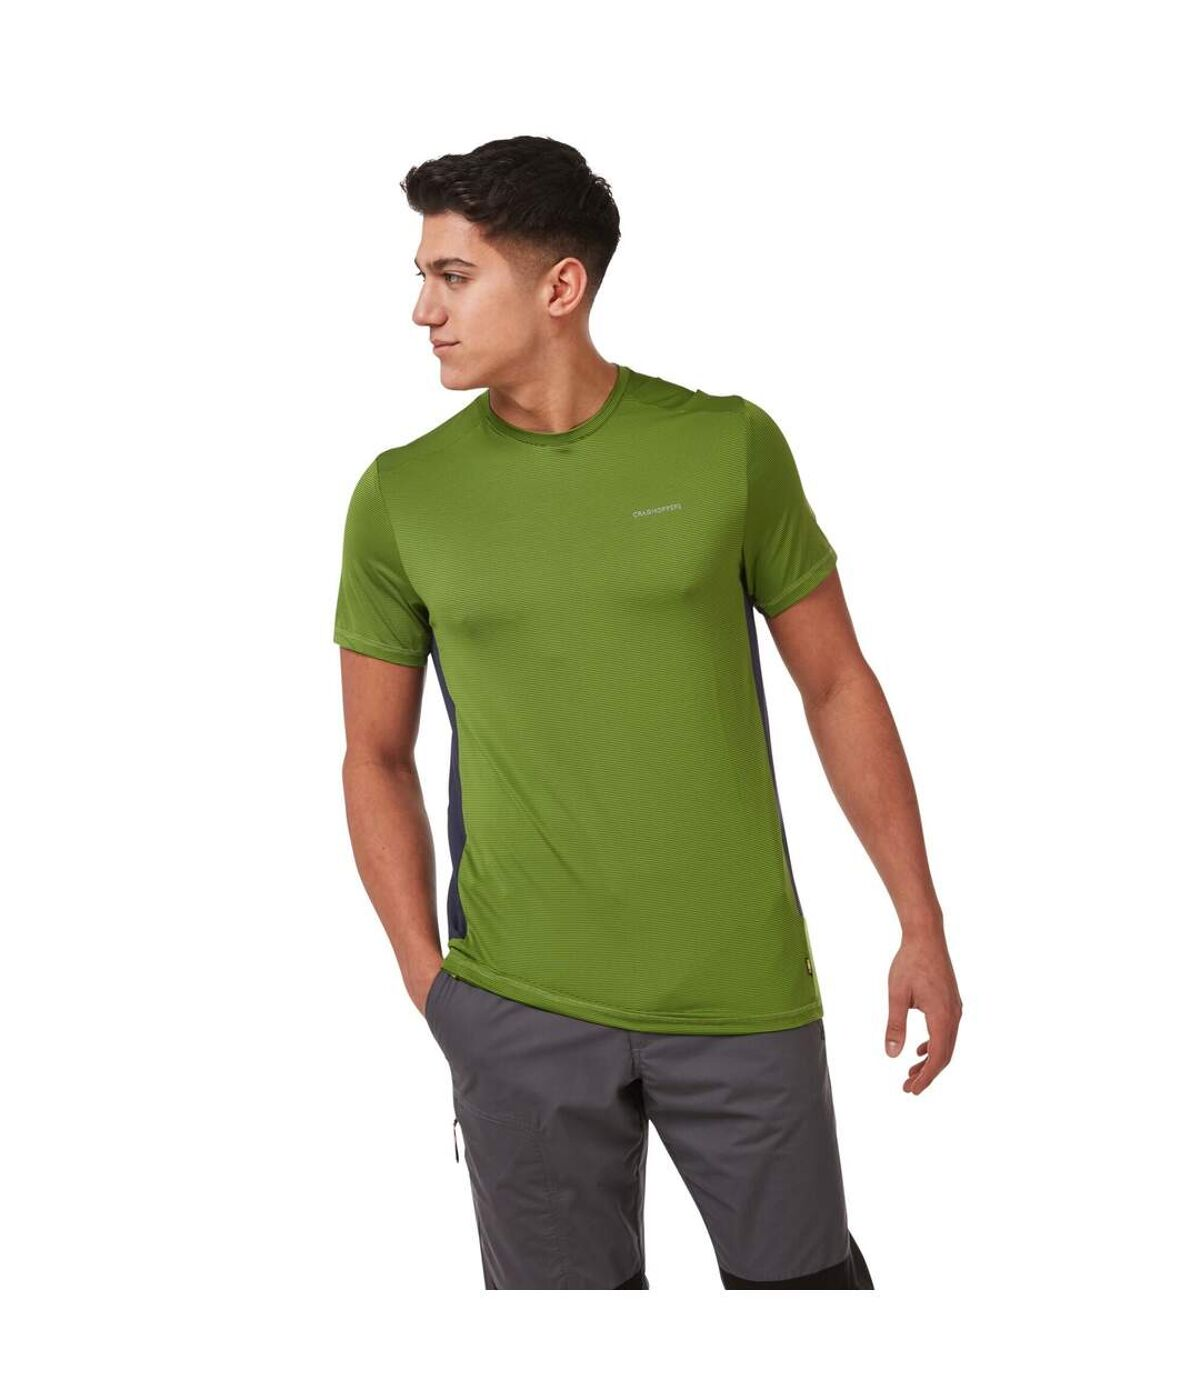 Craghoppers Mens Atmos Short Sleeved T-Shirt (Cloud Grey) - UTCG1293